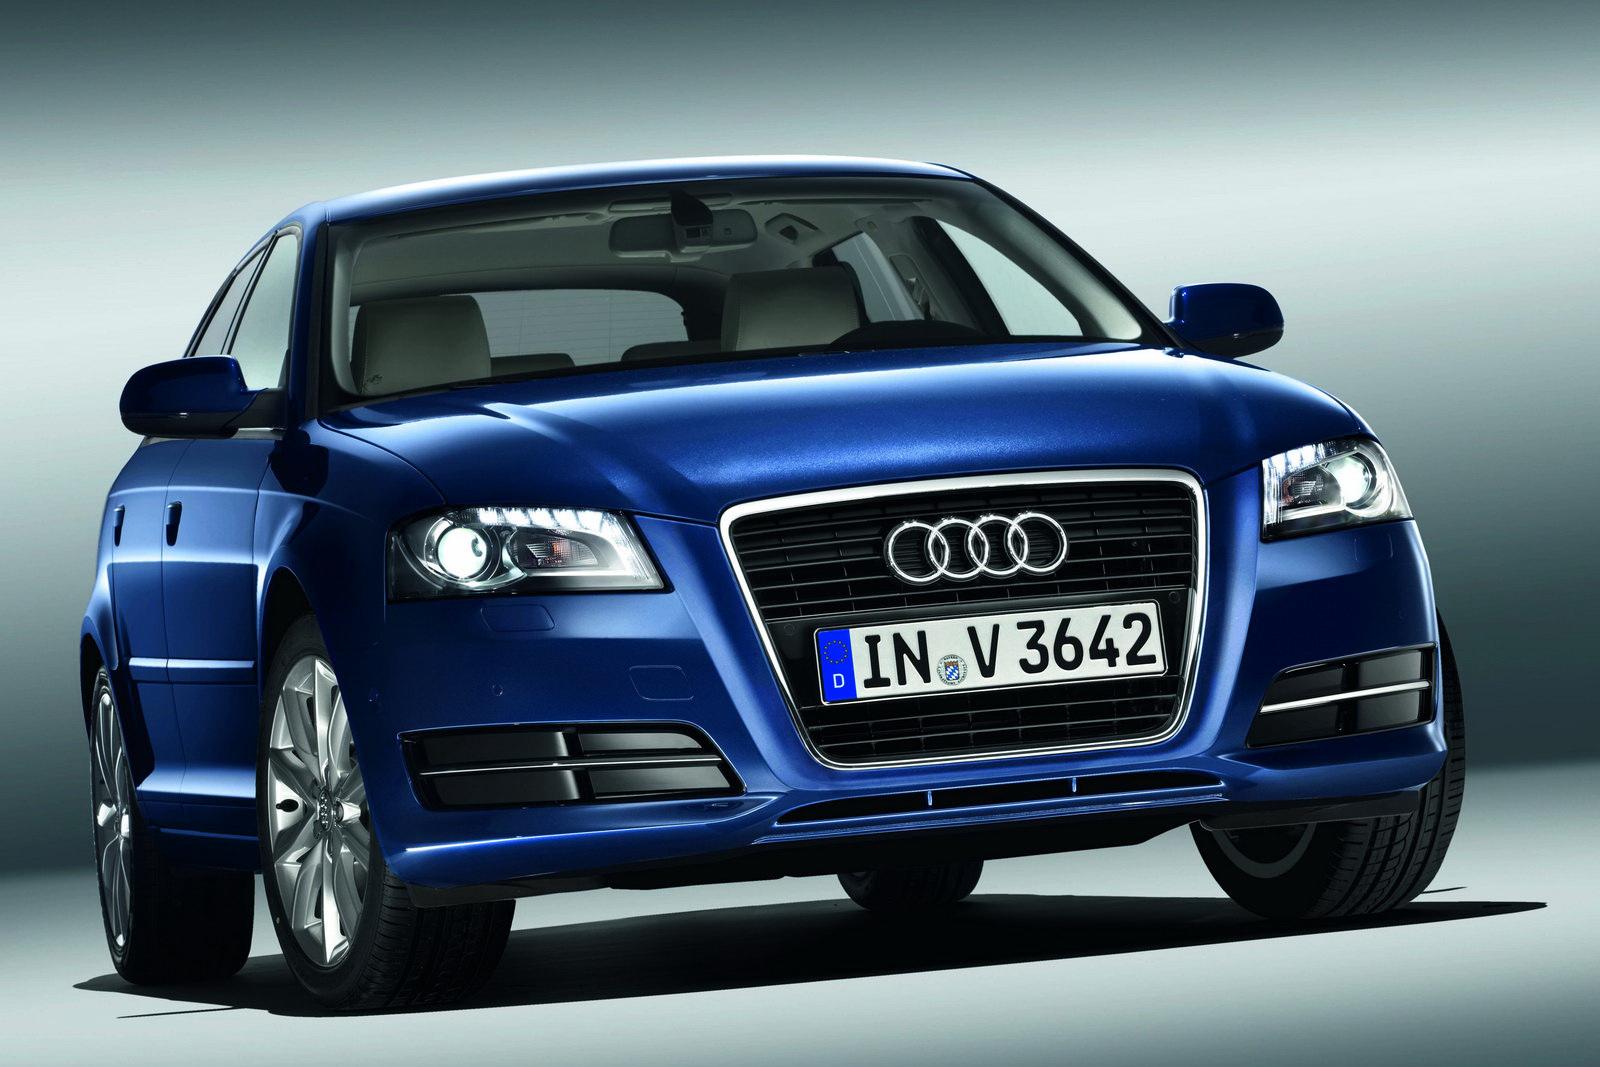 http://3.bp.blogspot.com/_FoXyvaPSnVk/S74IEXVN8CI/AAAAAAACugk/apXAG6dJluI/s1600/2011-Audi-A3-Sportback-1.jpg